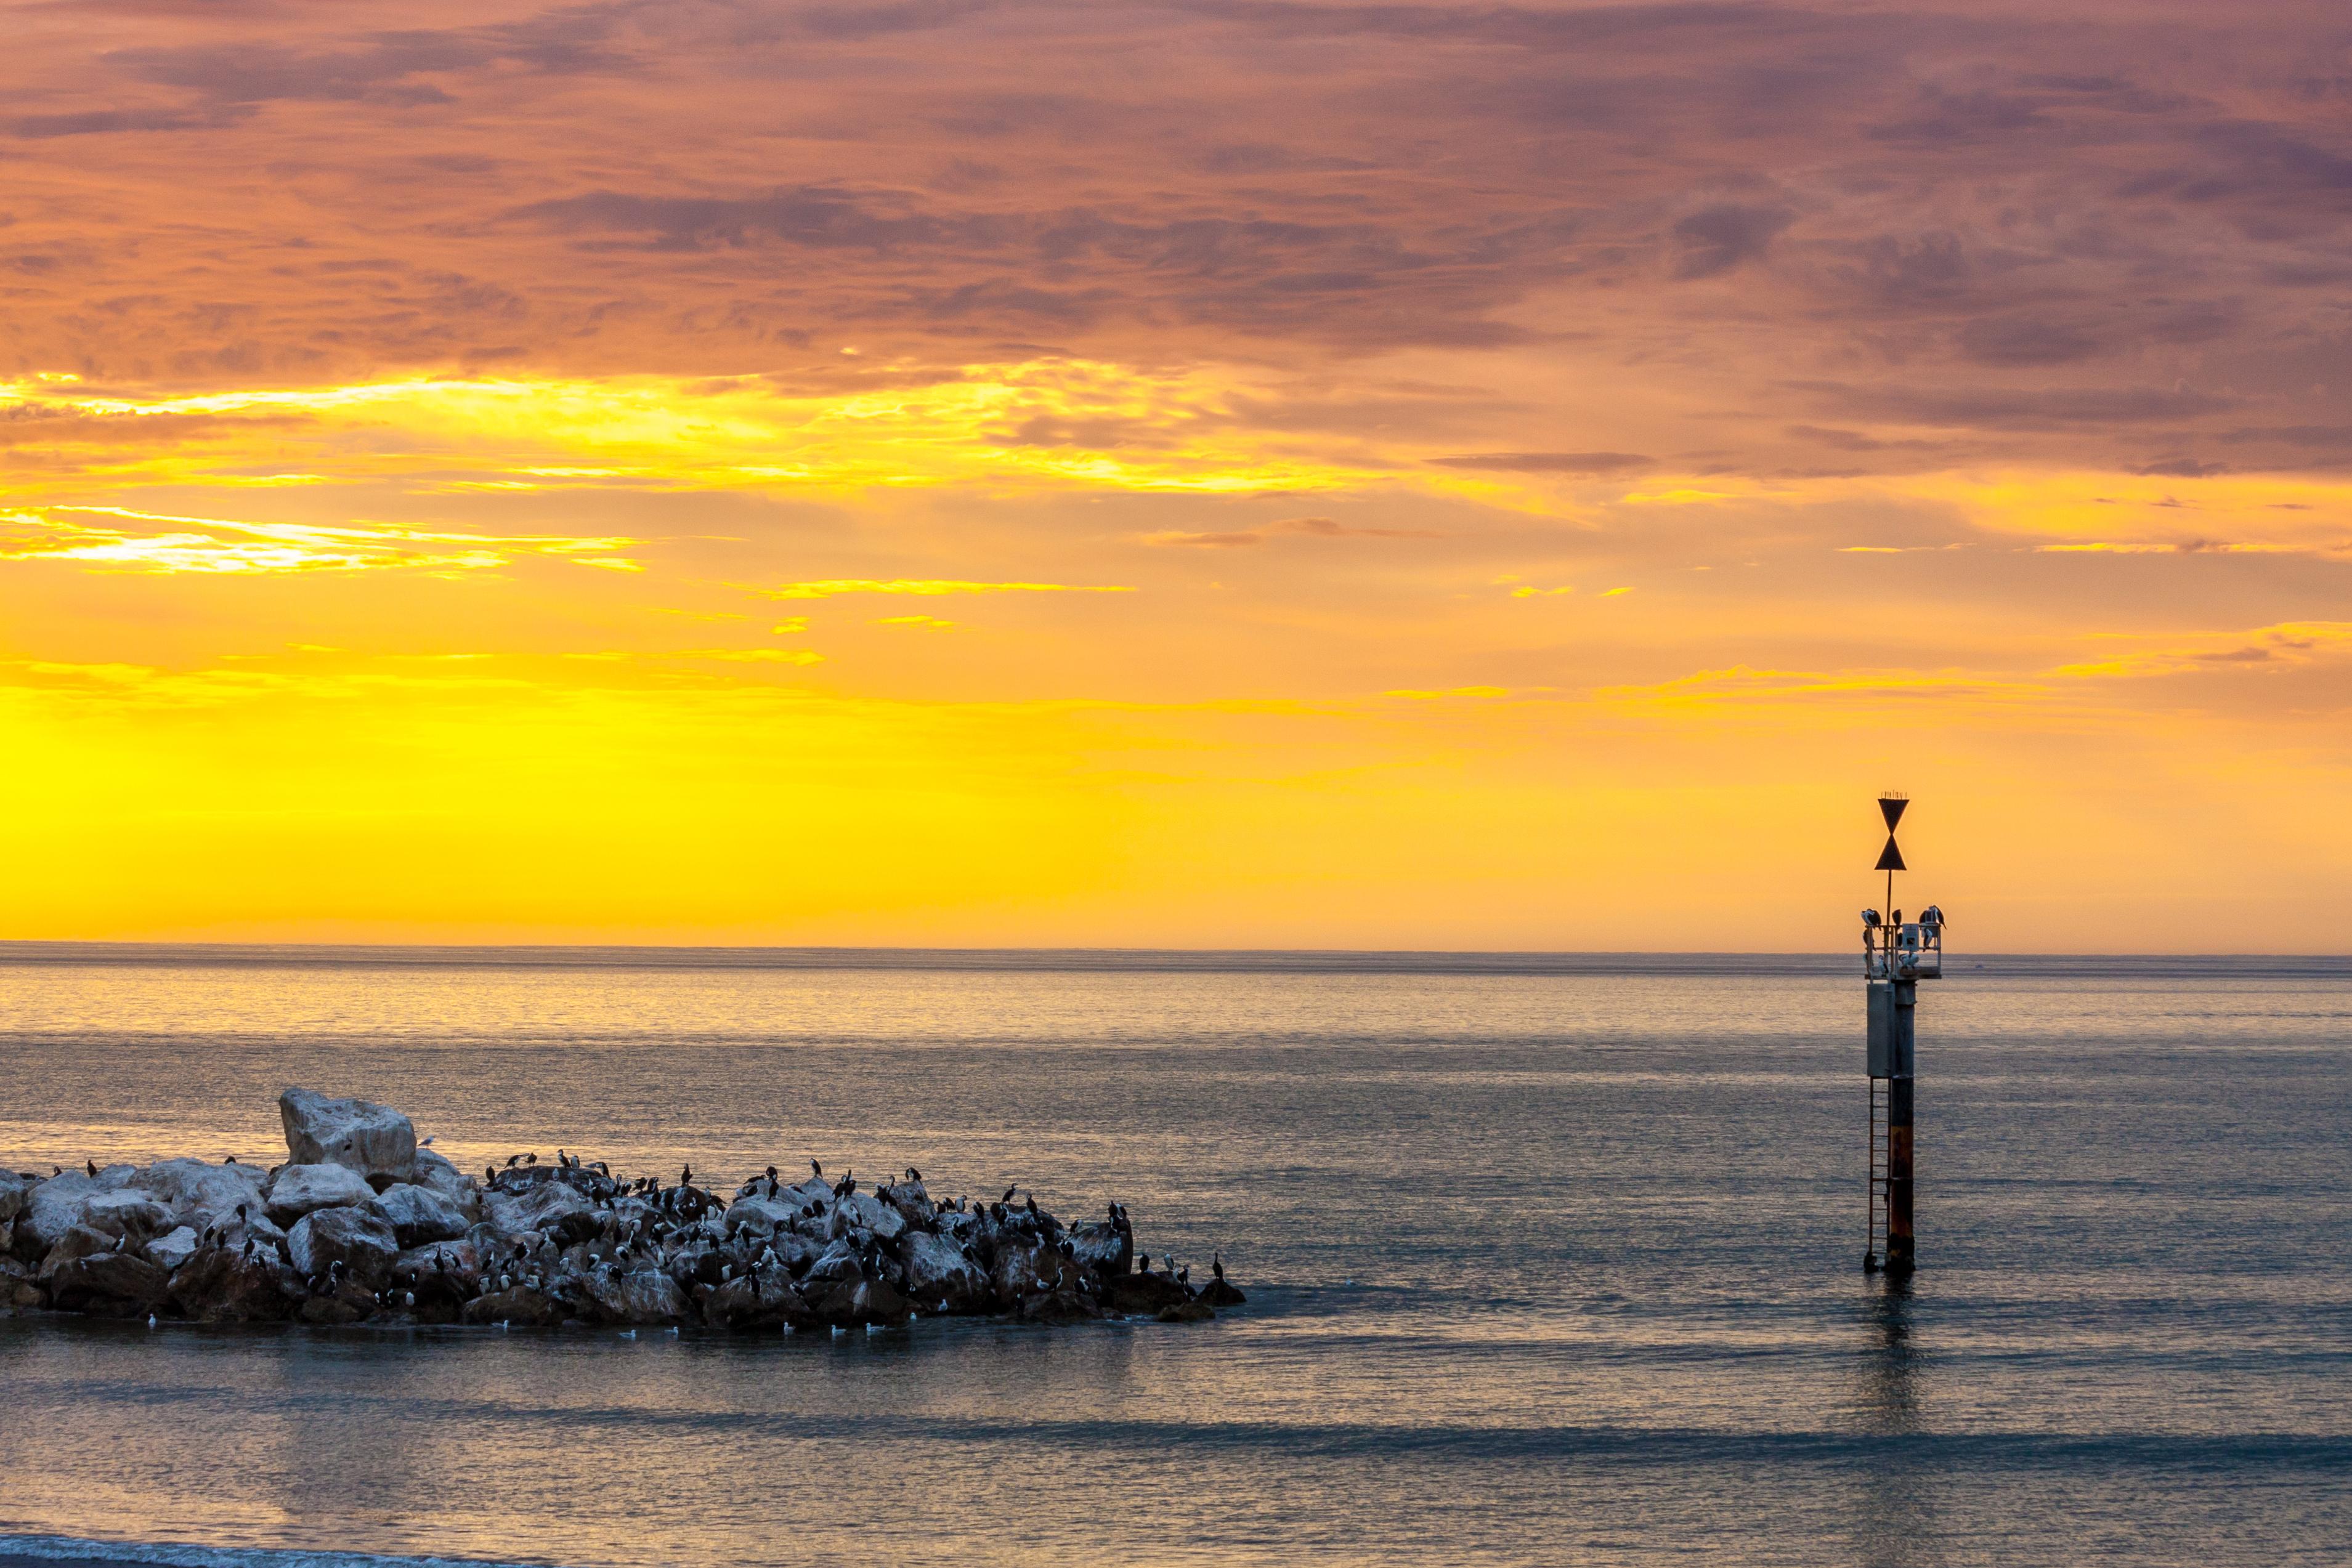 File:Coastal Sunset HDR (8233171831).jpg - Wikimedia Commons